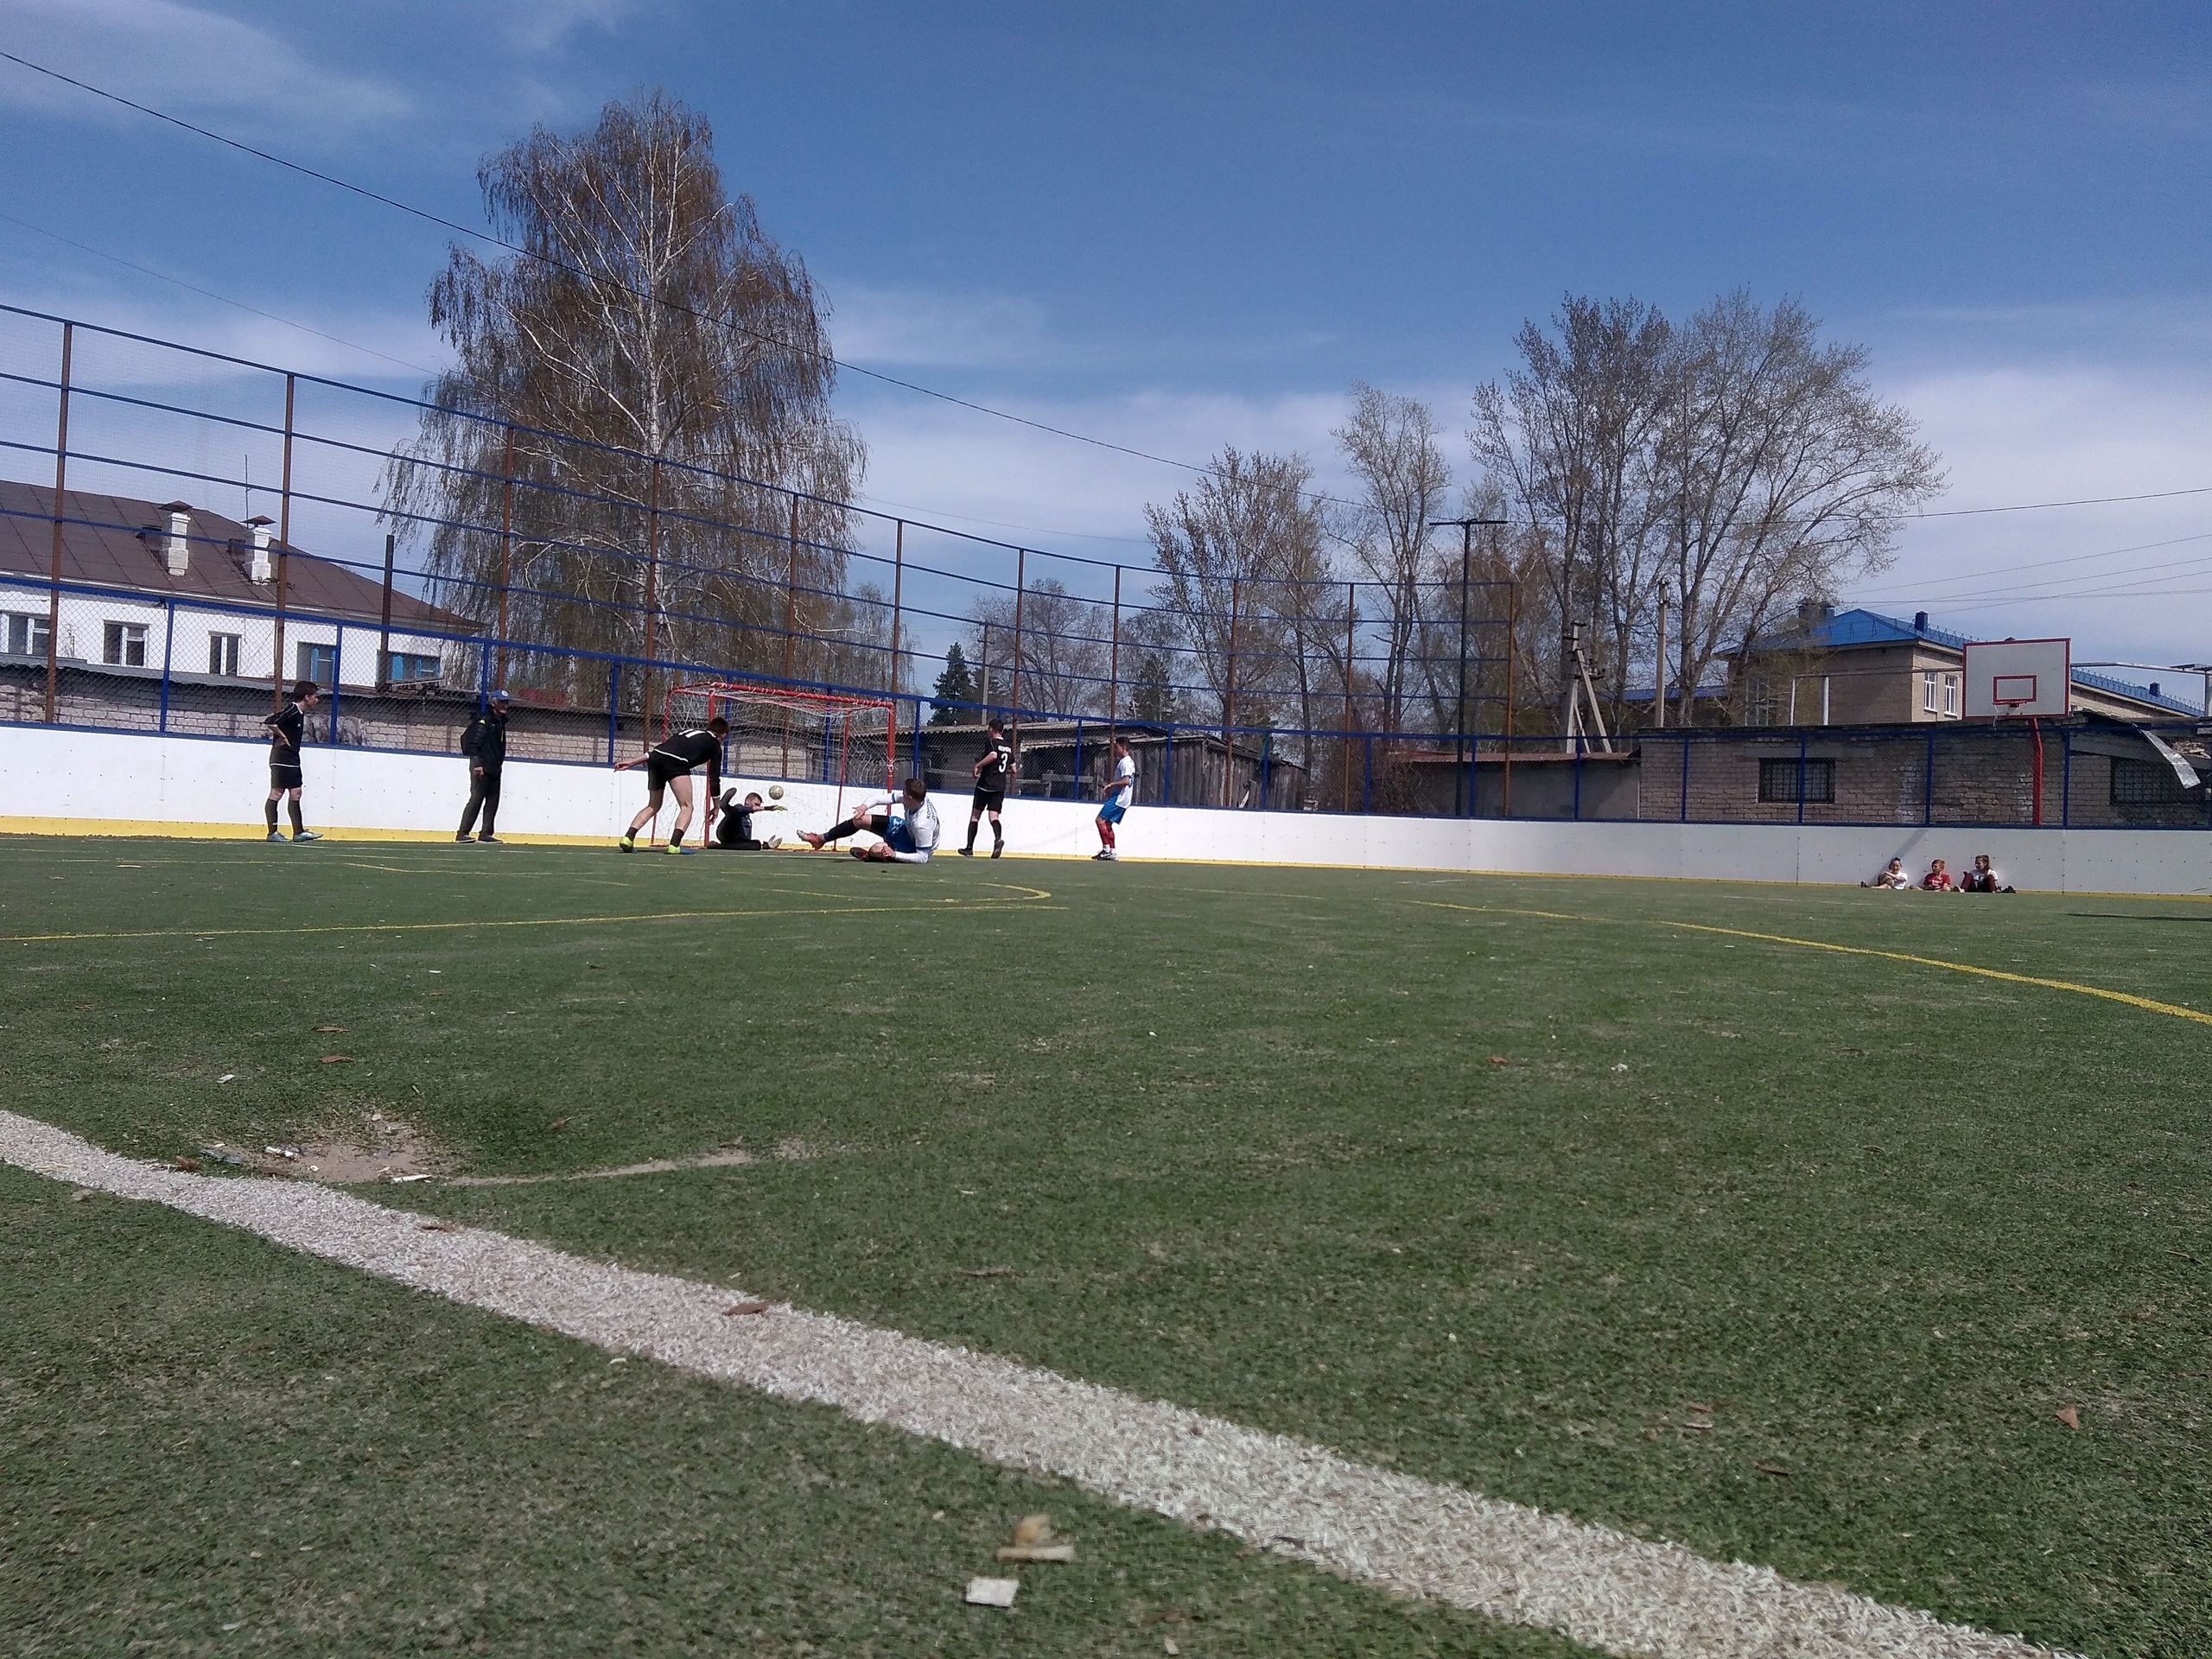 Турнир по мини-футболу КПРФ Шигоны 2019